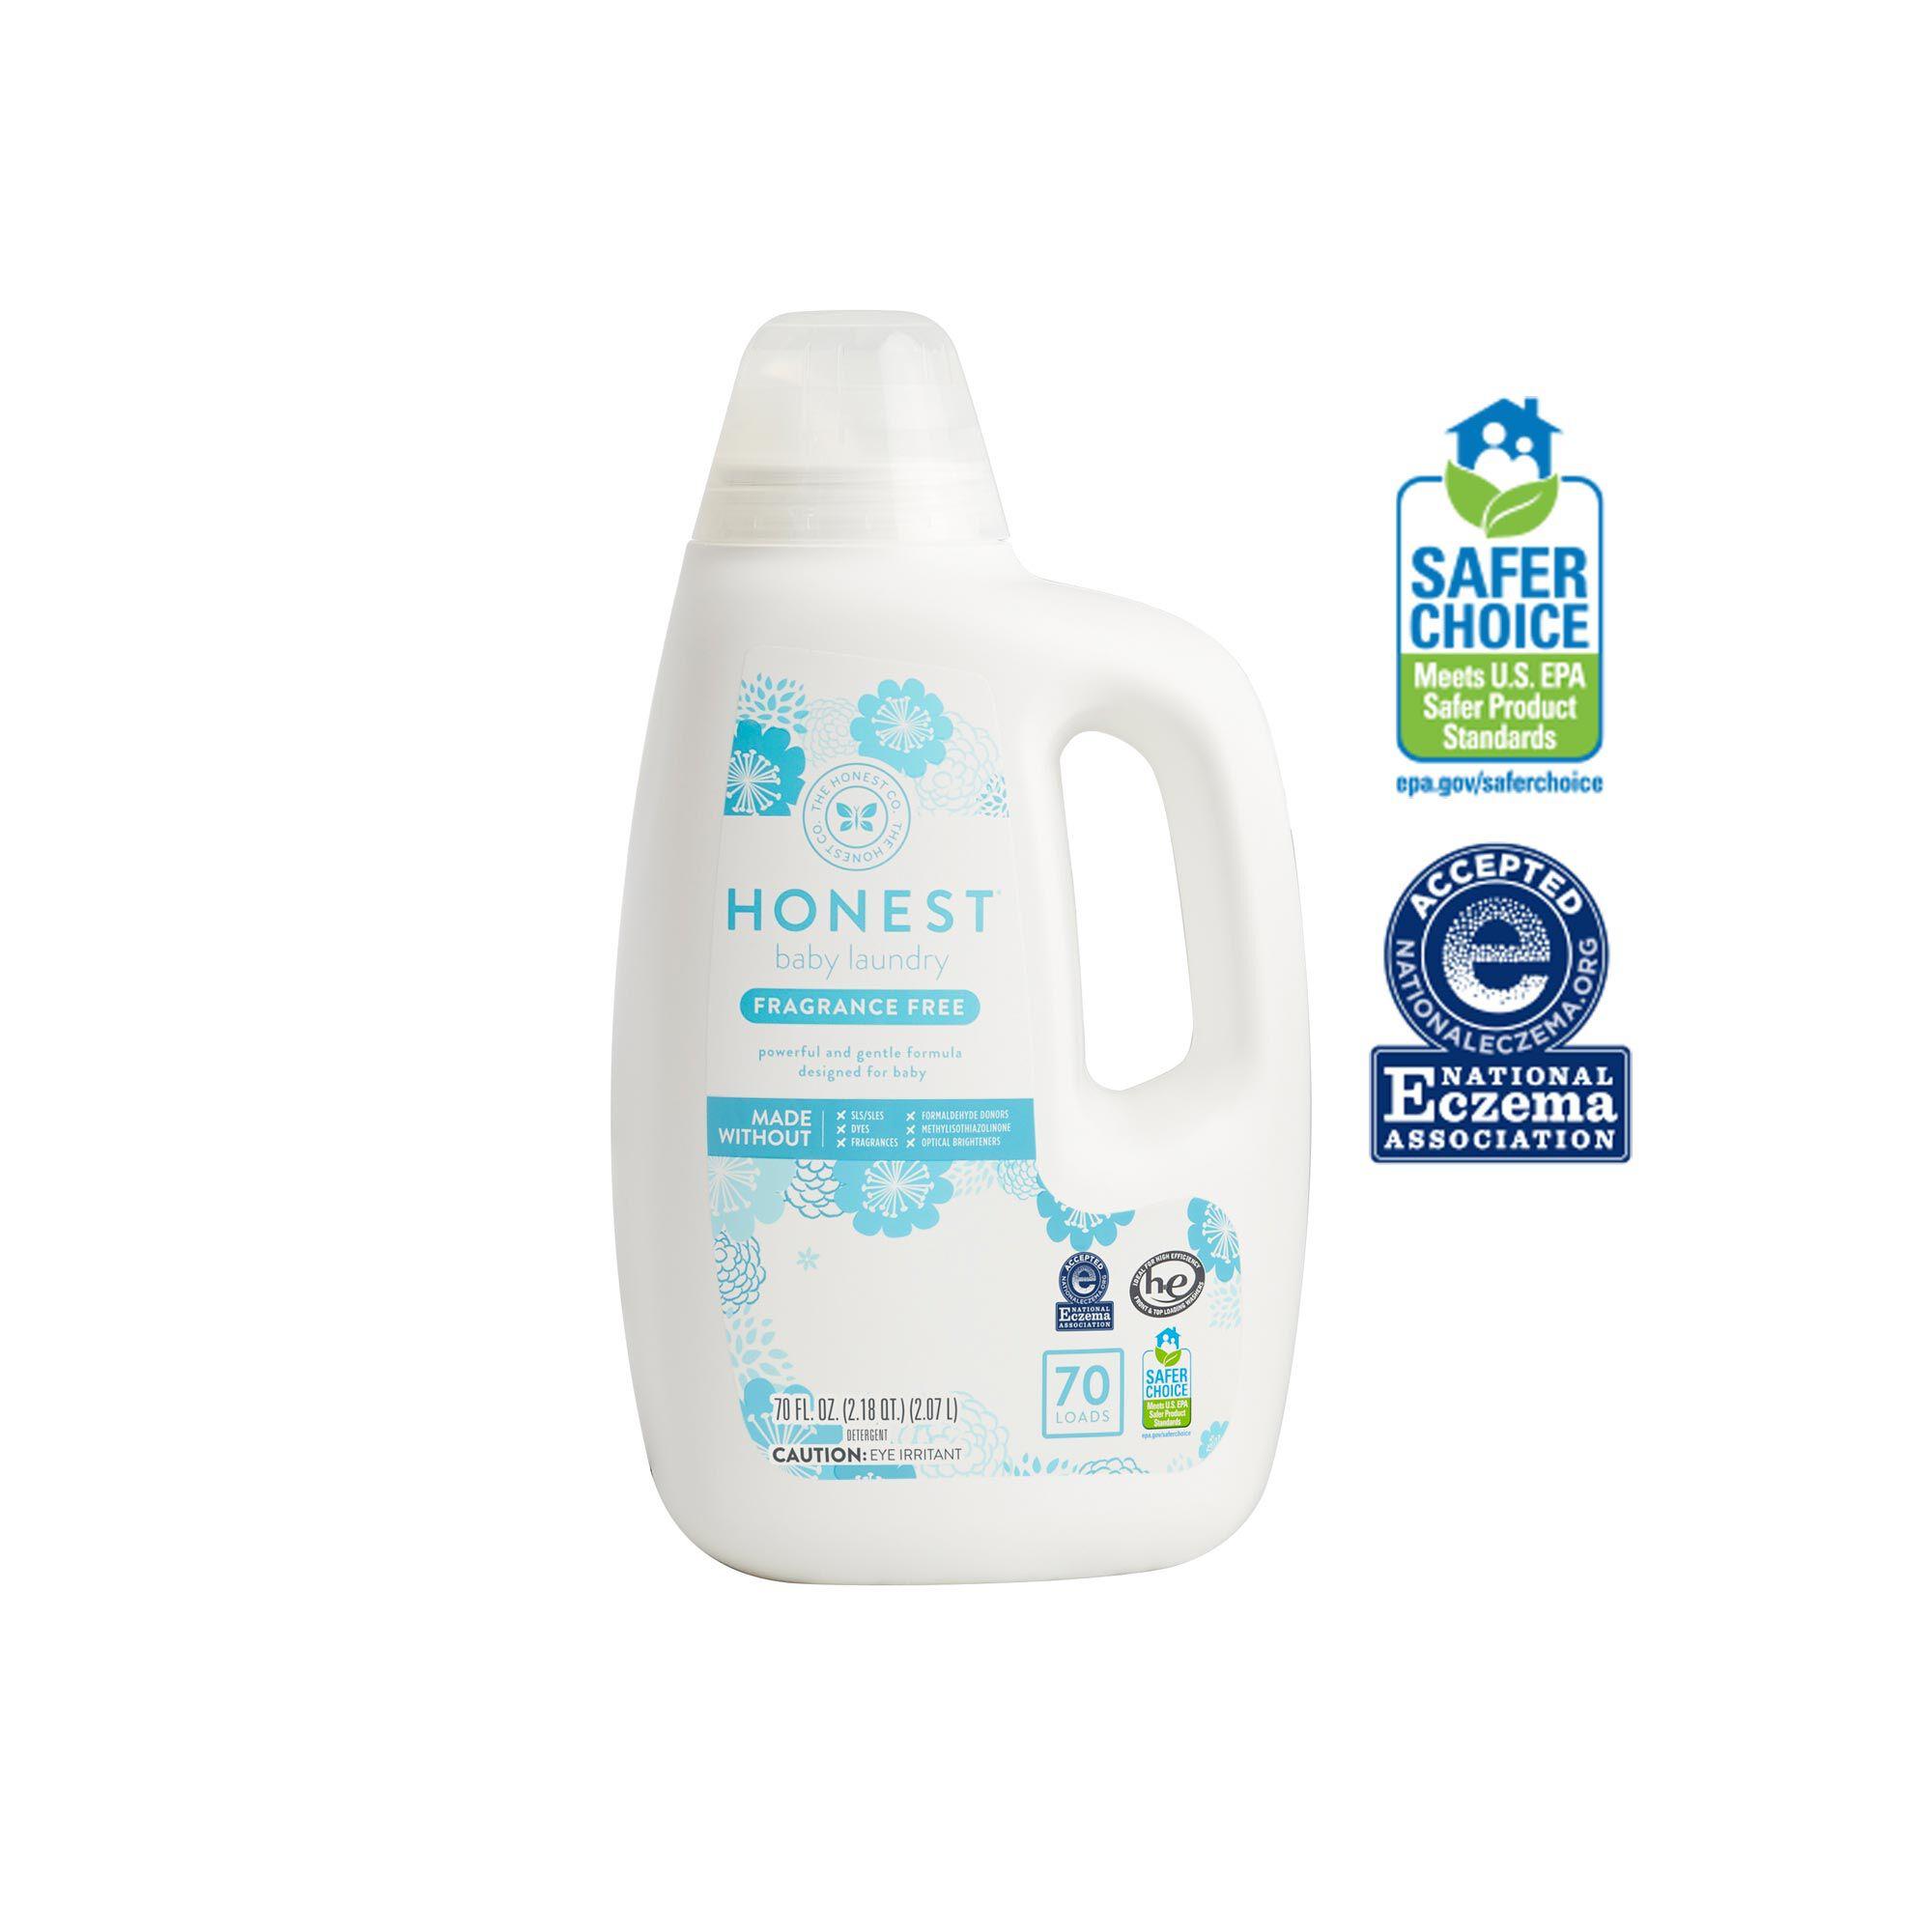 Hypoallergenic Baby Laundry Detergent